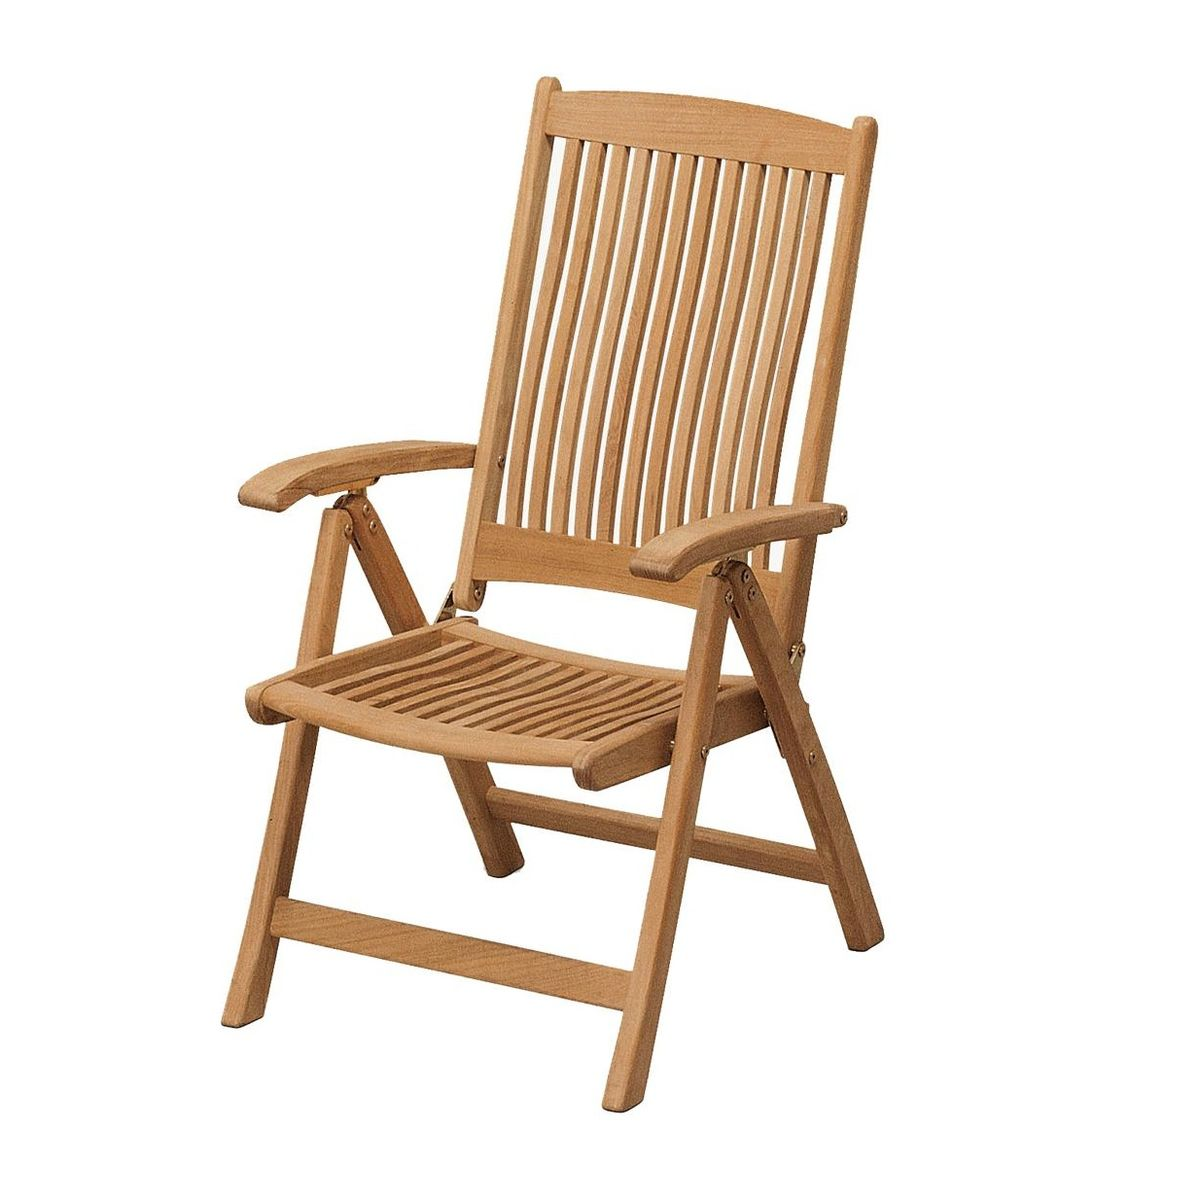 Columbus chaise de jardin teck skagerak - Chaise teck jardin ...